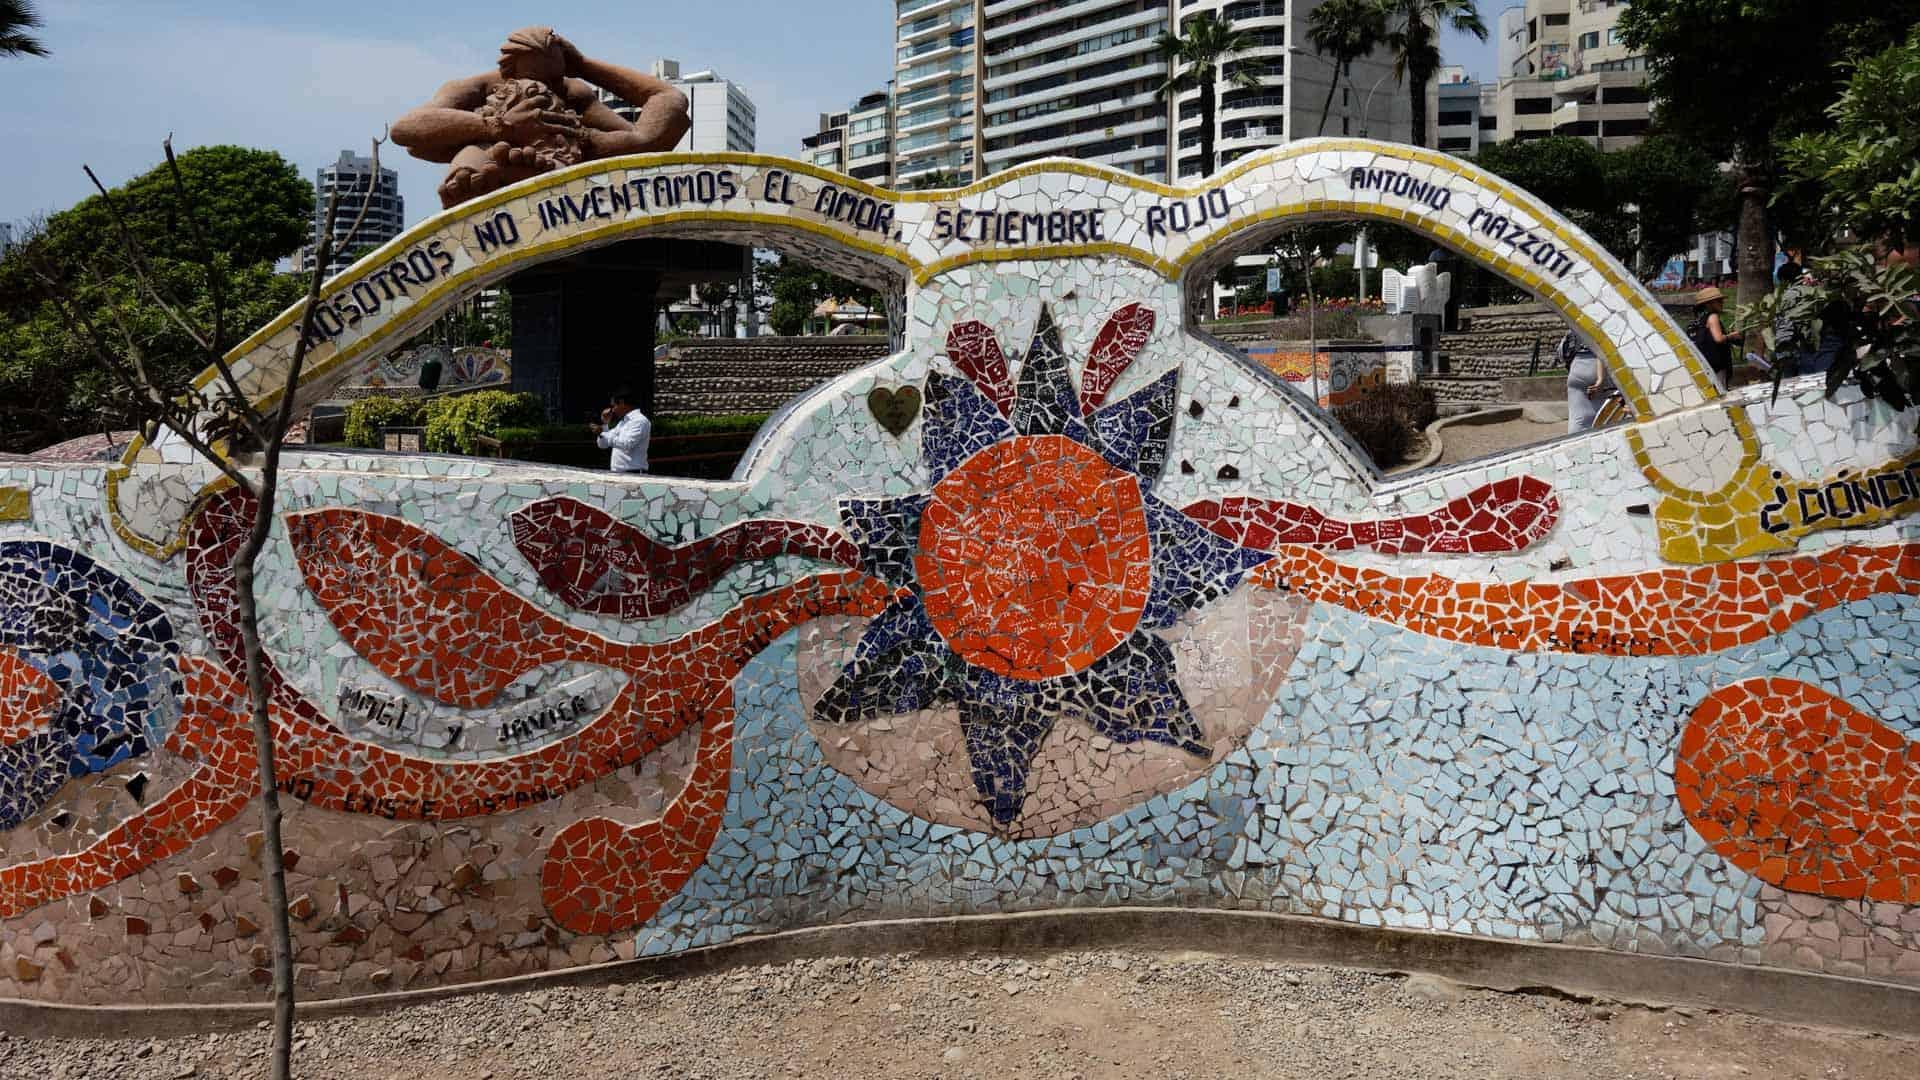 Parque del Amor in Miraflores, Lima, Peru